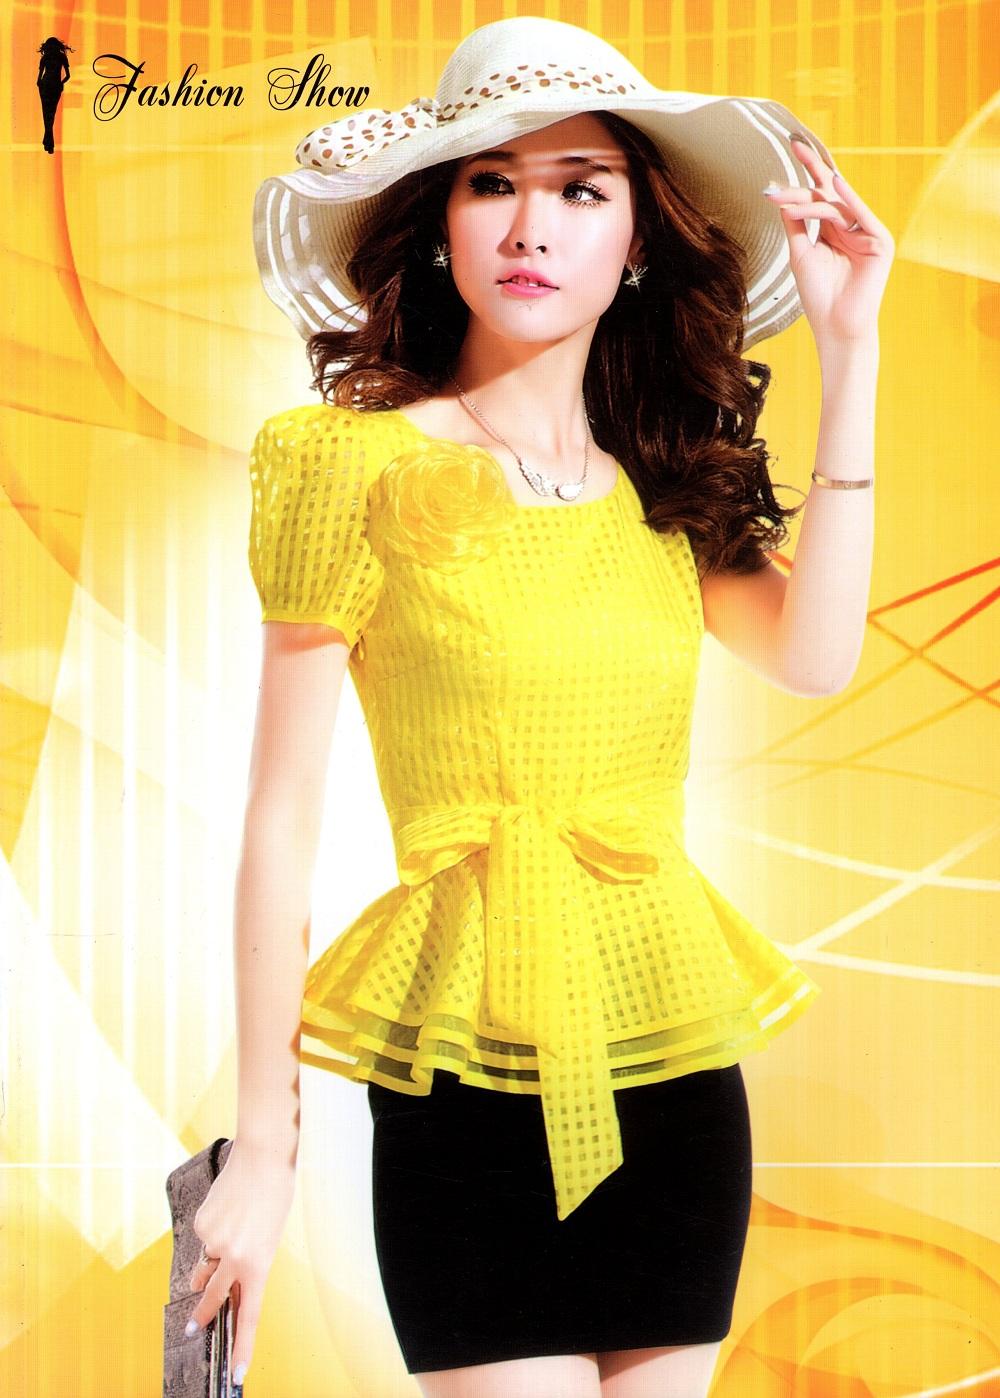 Catalogue Thời Trang Hàn Quốc Show (Tập 1)